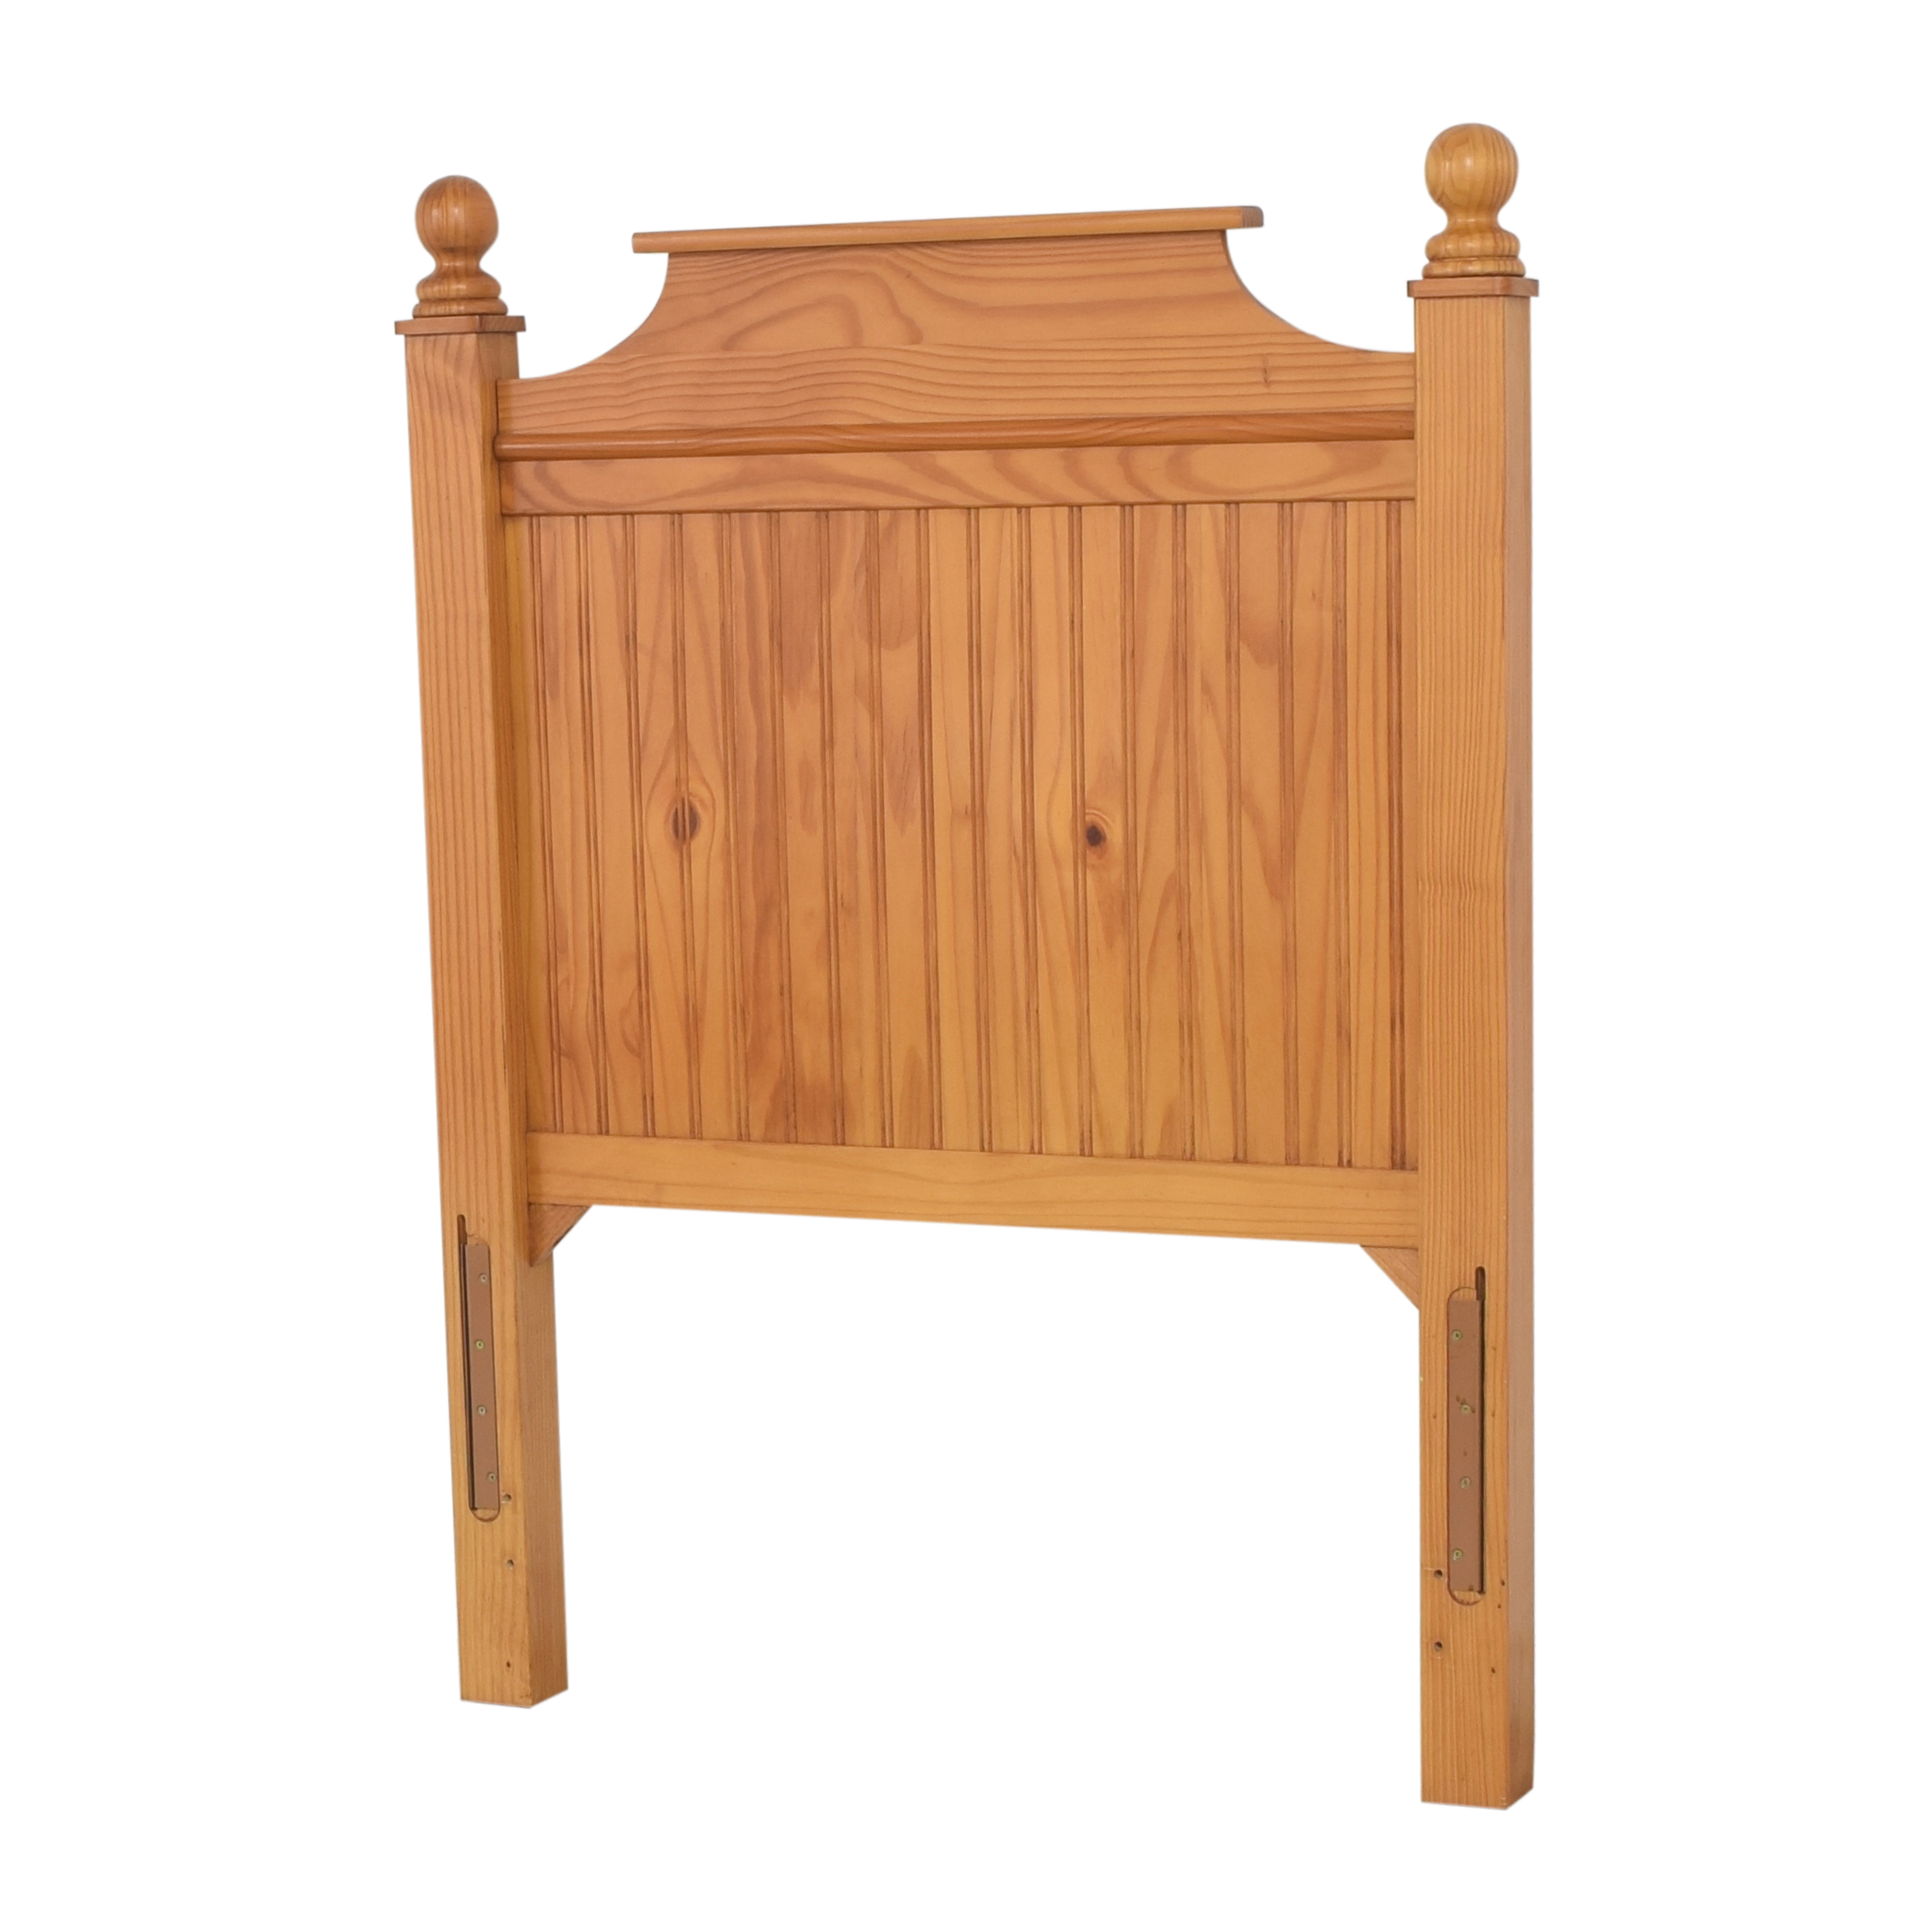 Stanley Furniture Stanley Furniture Low Post Twin Headboard discount